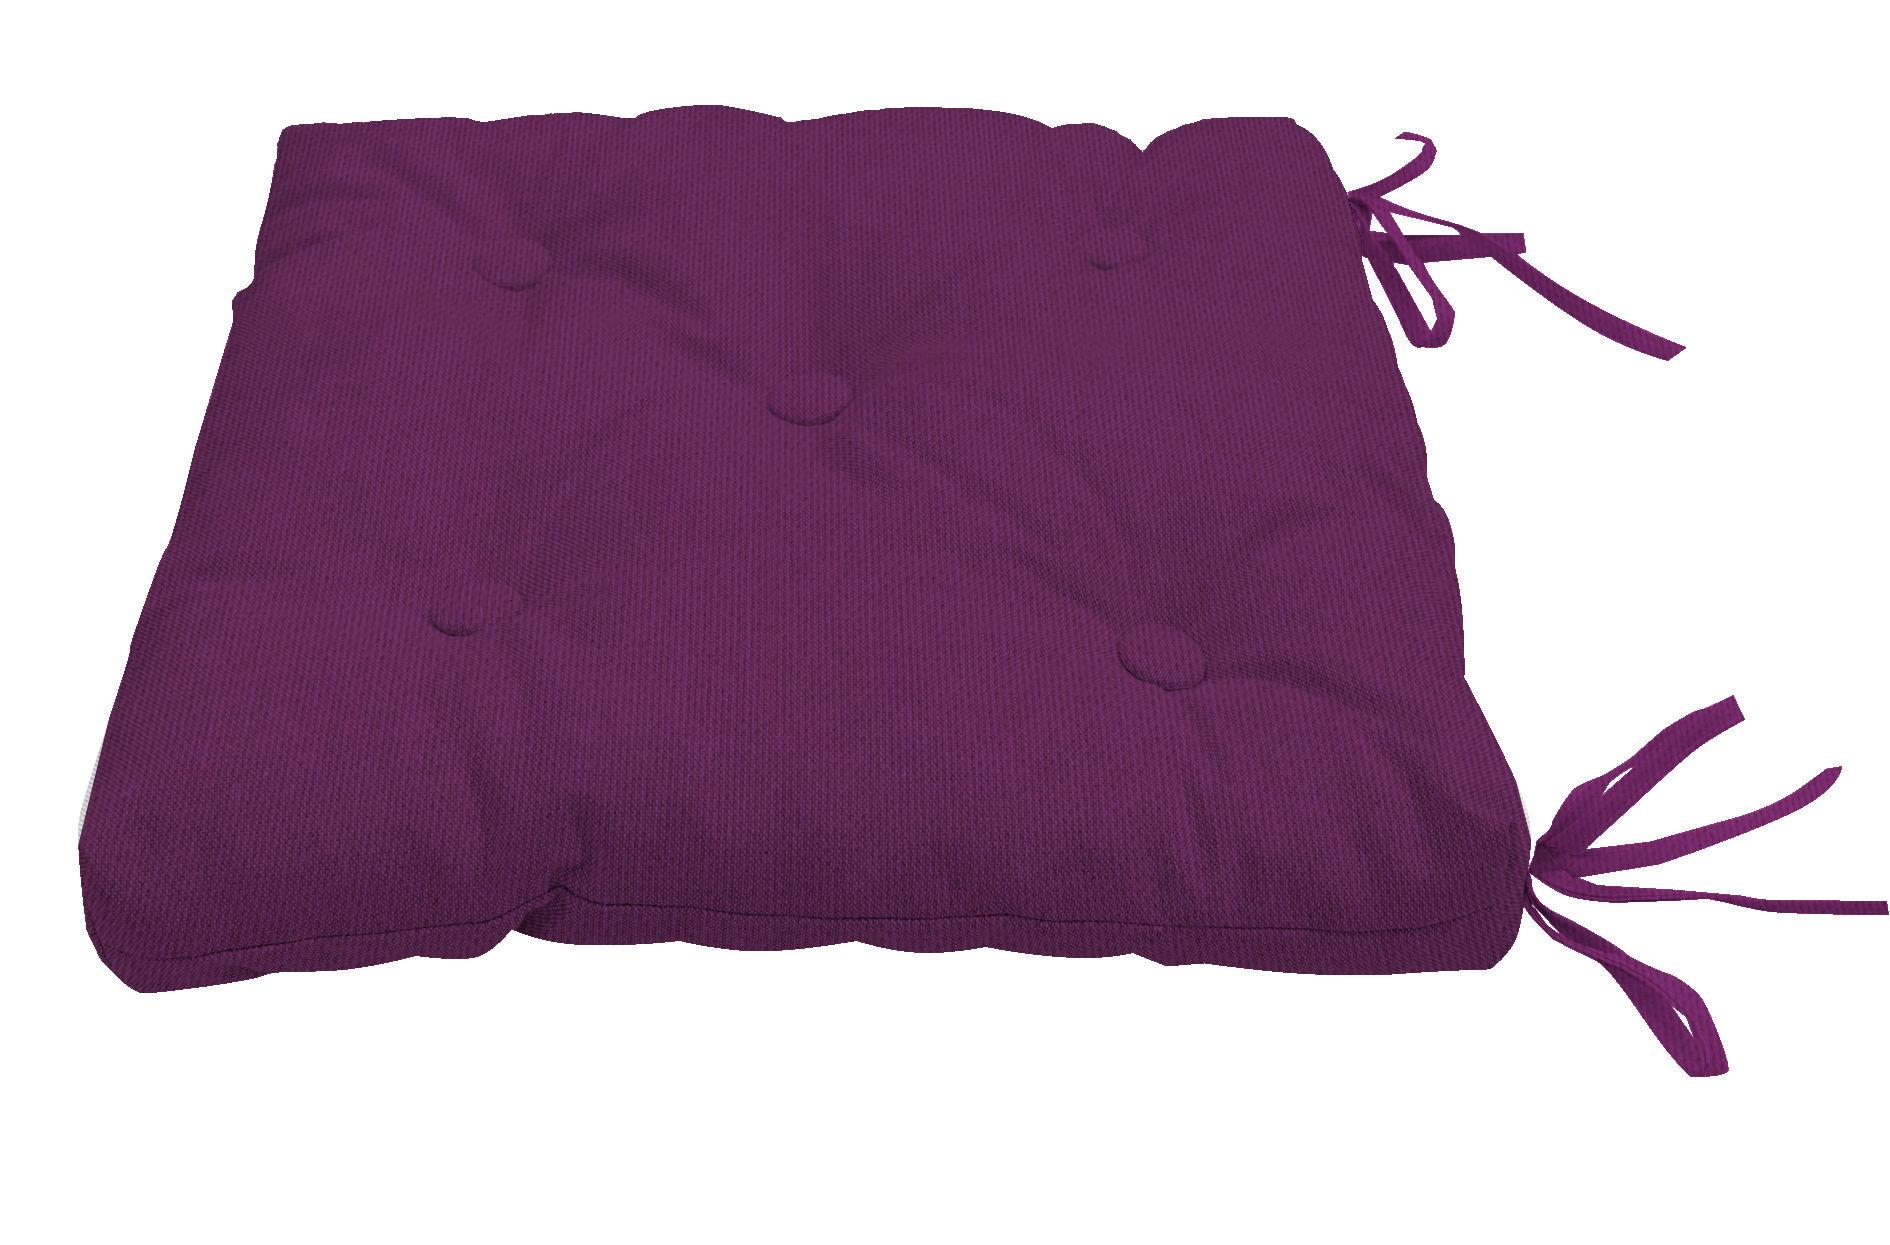 Подушки на стул Kauffort Подушка на стул Нosta Цвет: Темно-Фиолетовый (40х40) kauffort подушка на стул нosta цвет бордово фиолетовый 40х40